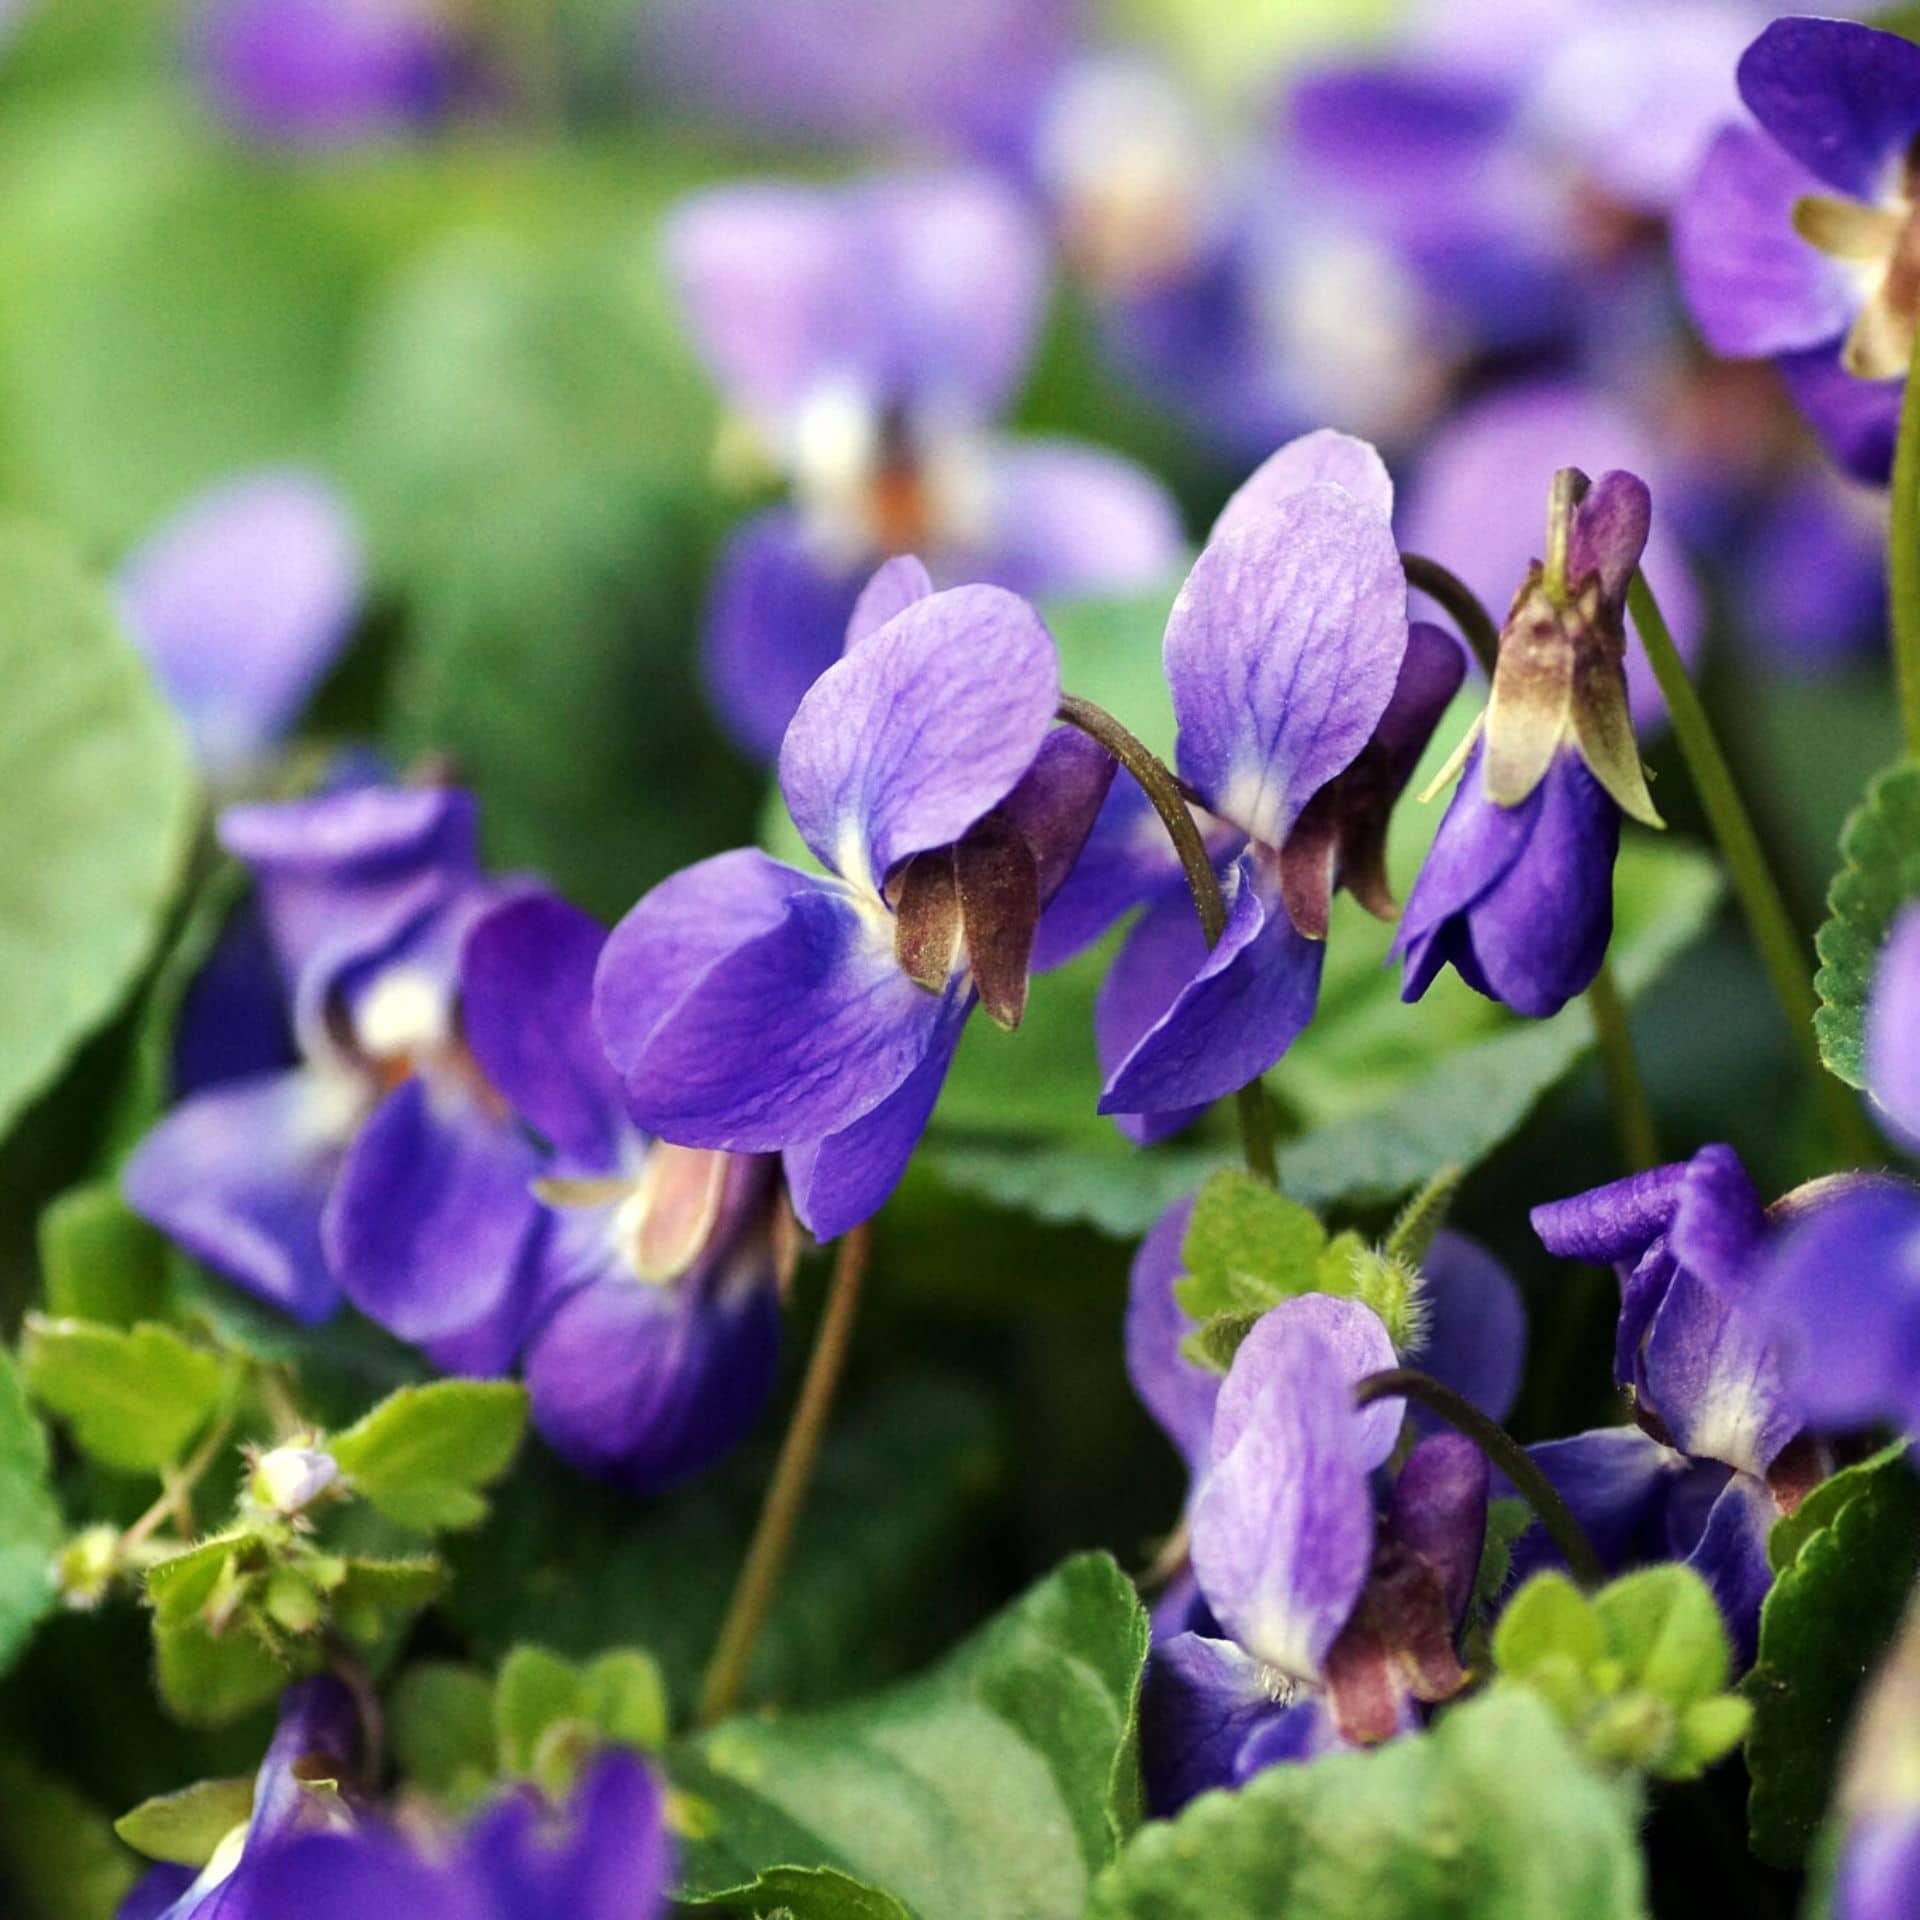 Maarts viooltje – Viola odorata